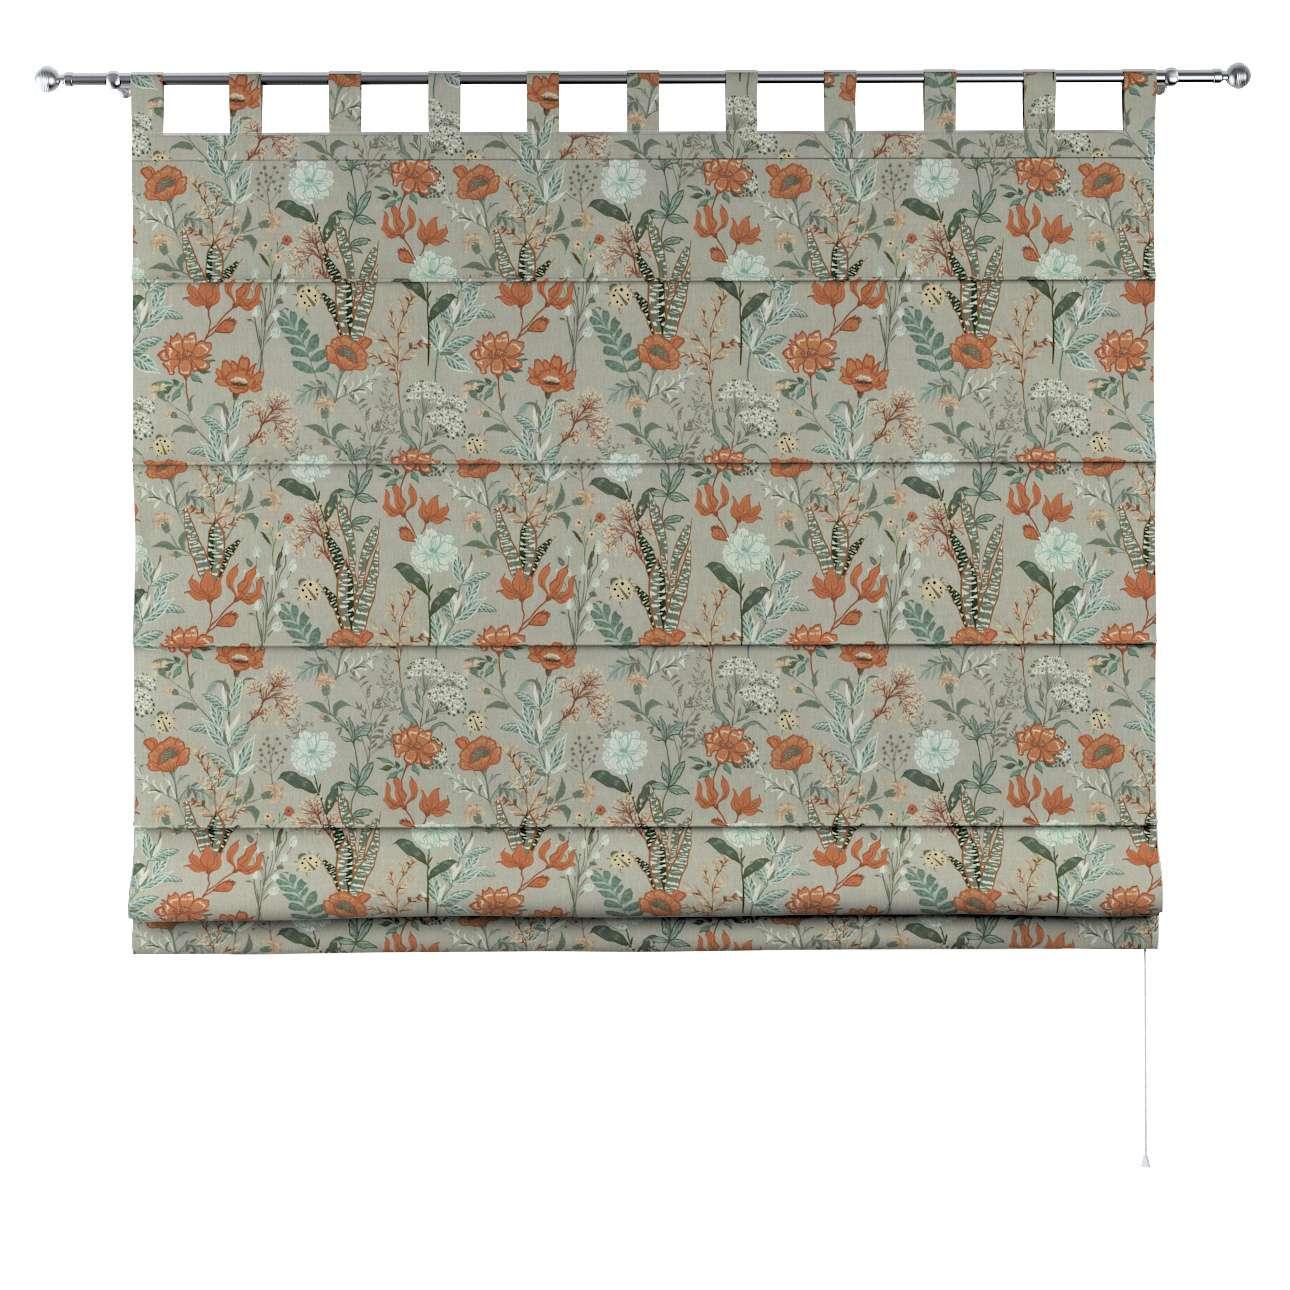 Rímska roleta Verona V kolekcii Flowers, tkanina: 143-70